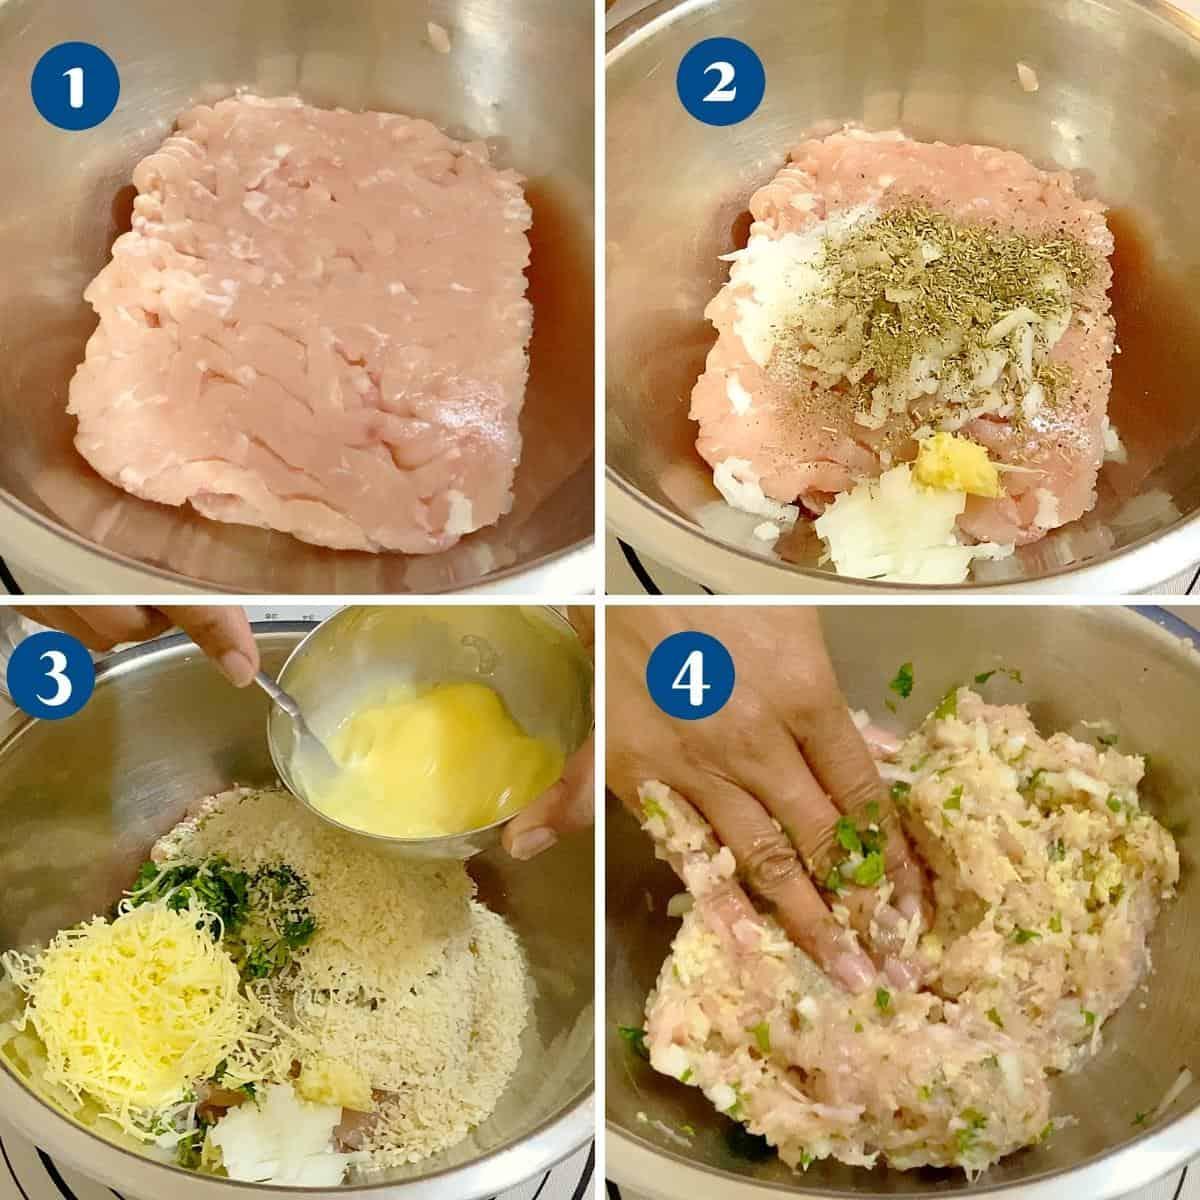 Progress pictures collage for ground chicken patties.